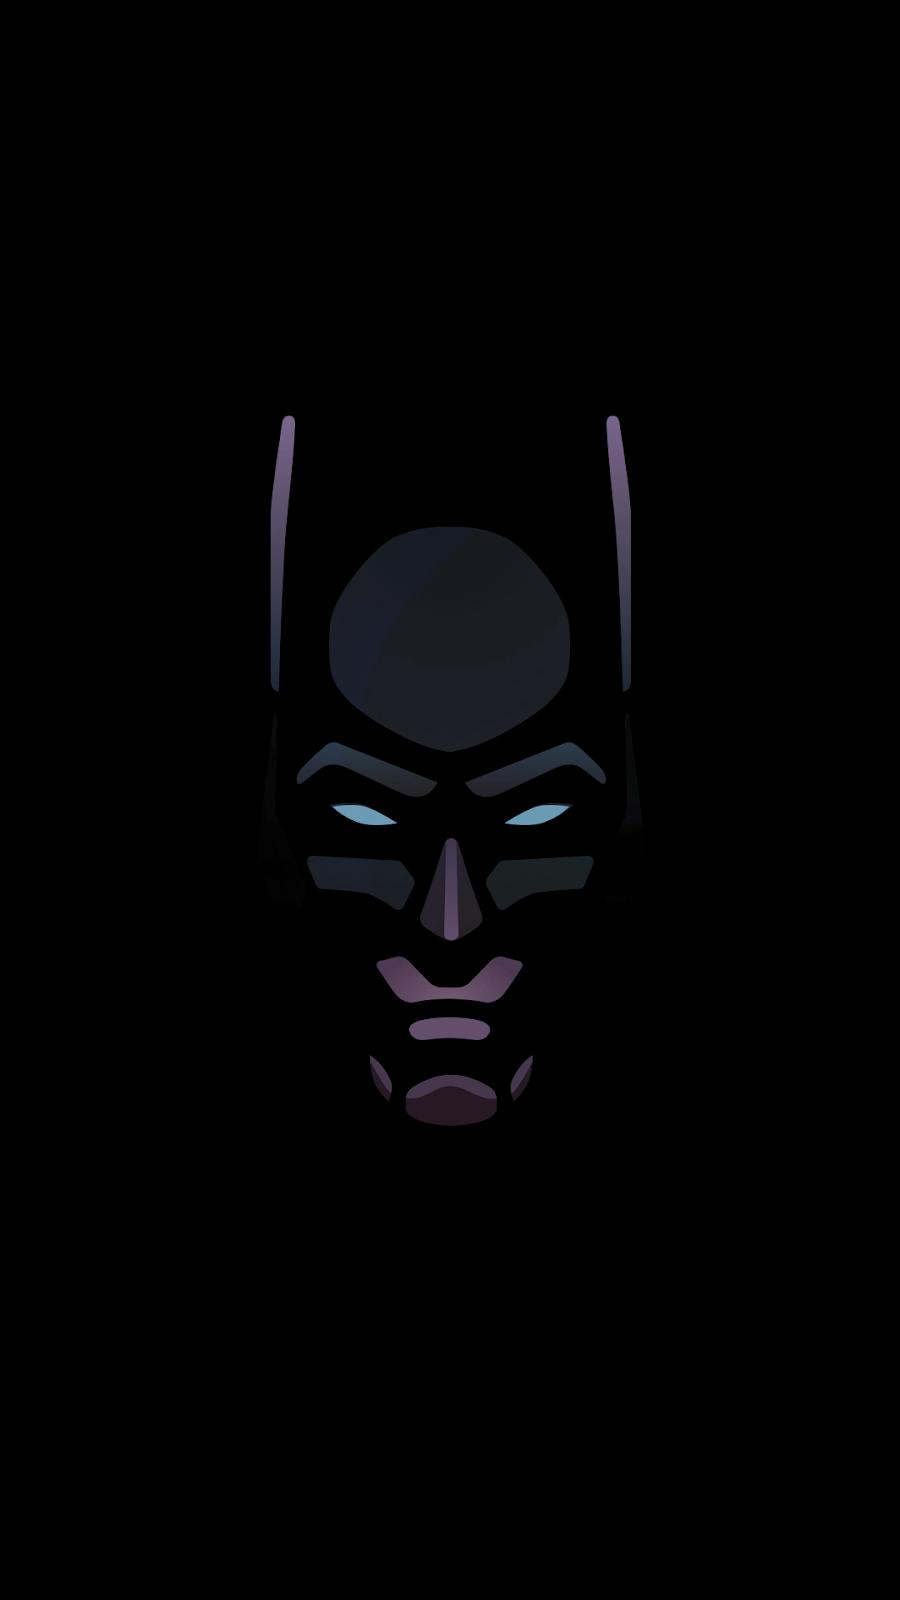 17 Batman Phone Wallpapers Cool Wallpapers Heroscreen Cc Batman Comic Wallpaper Batman Phone Batman